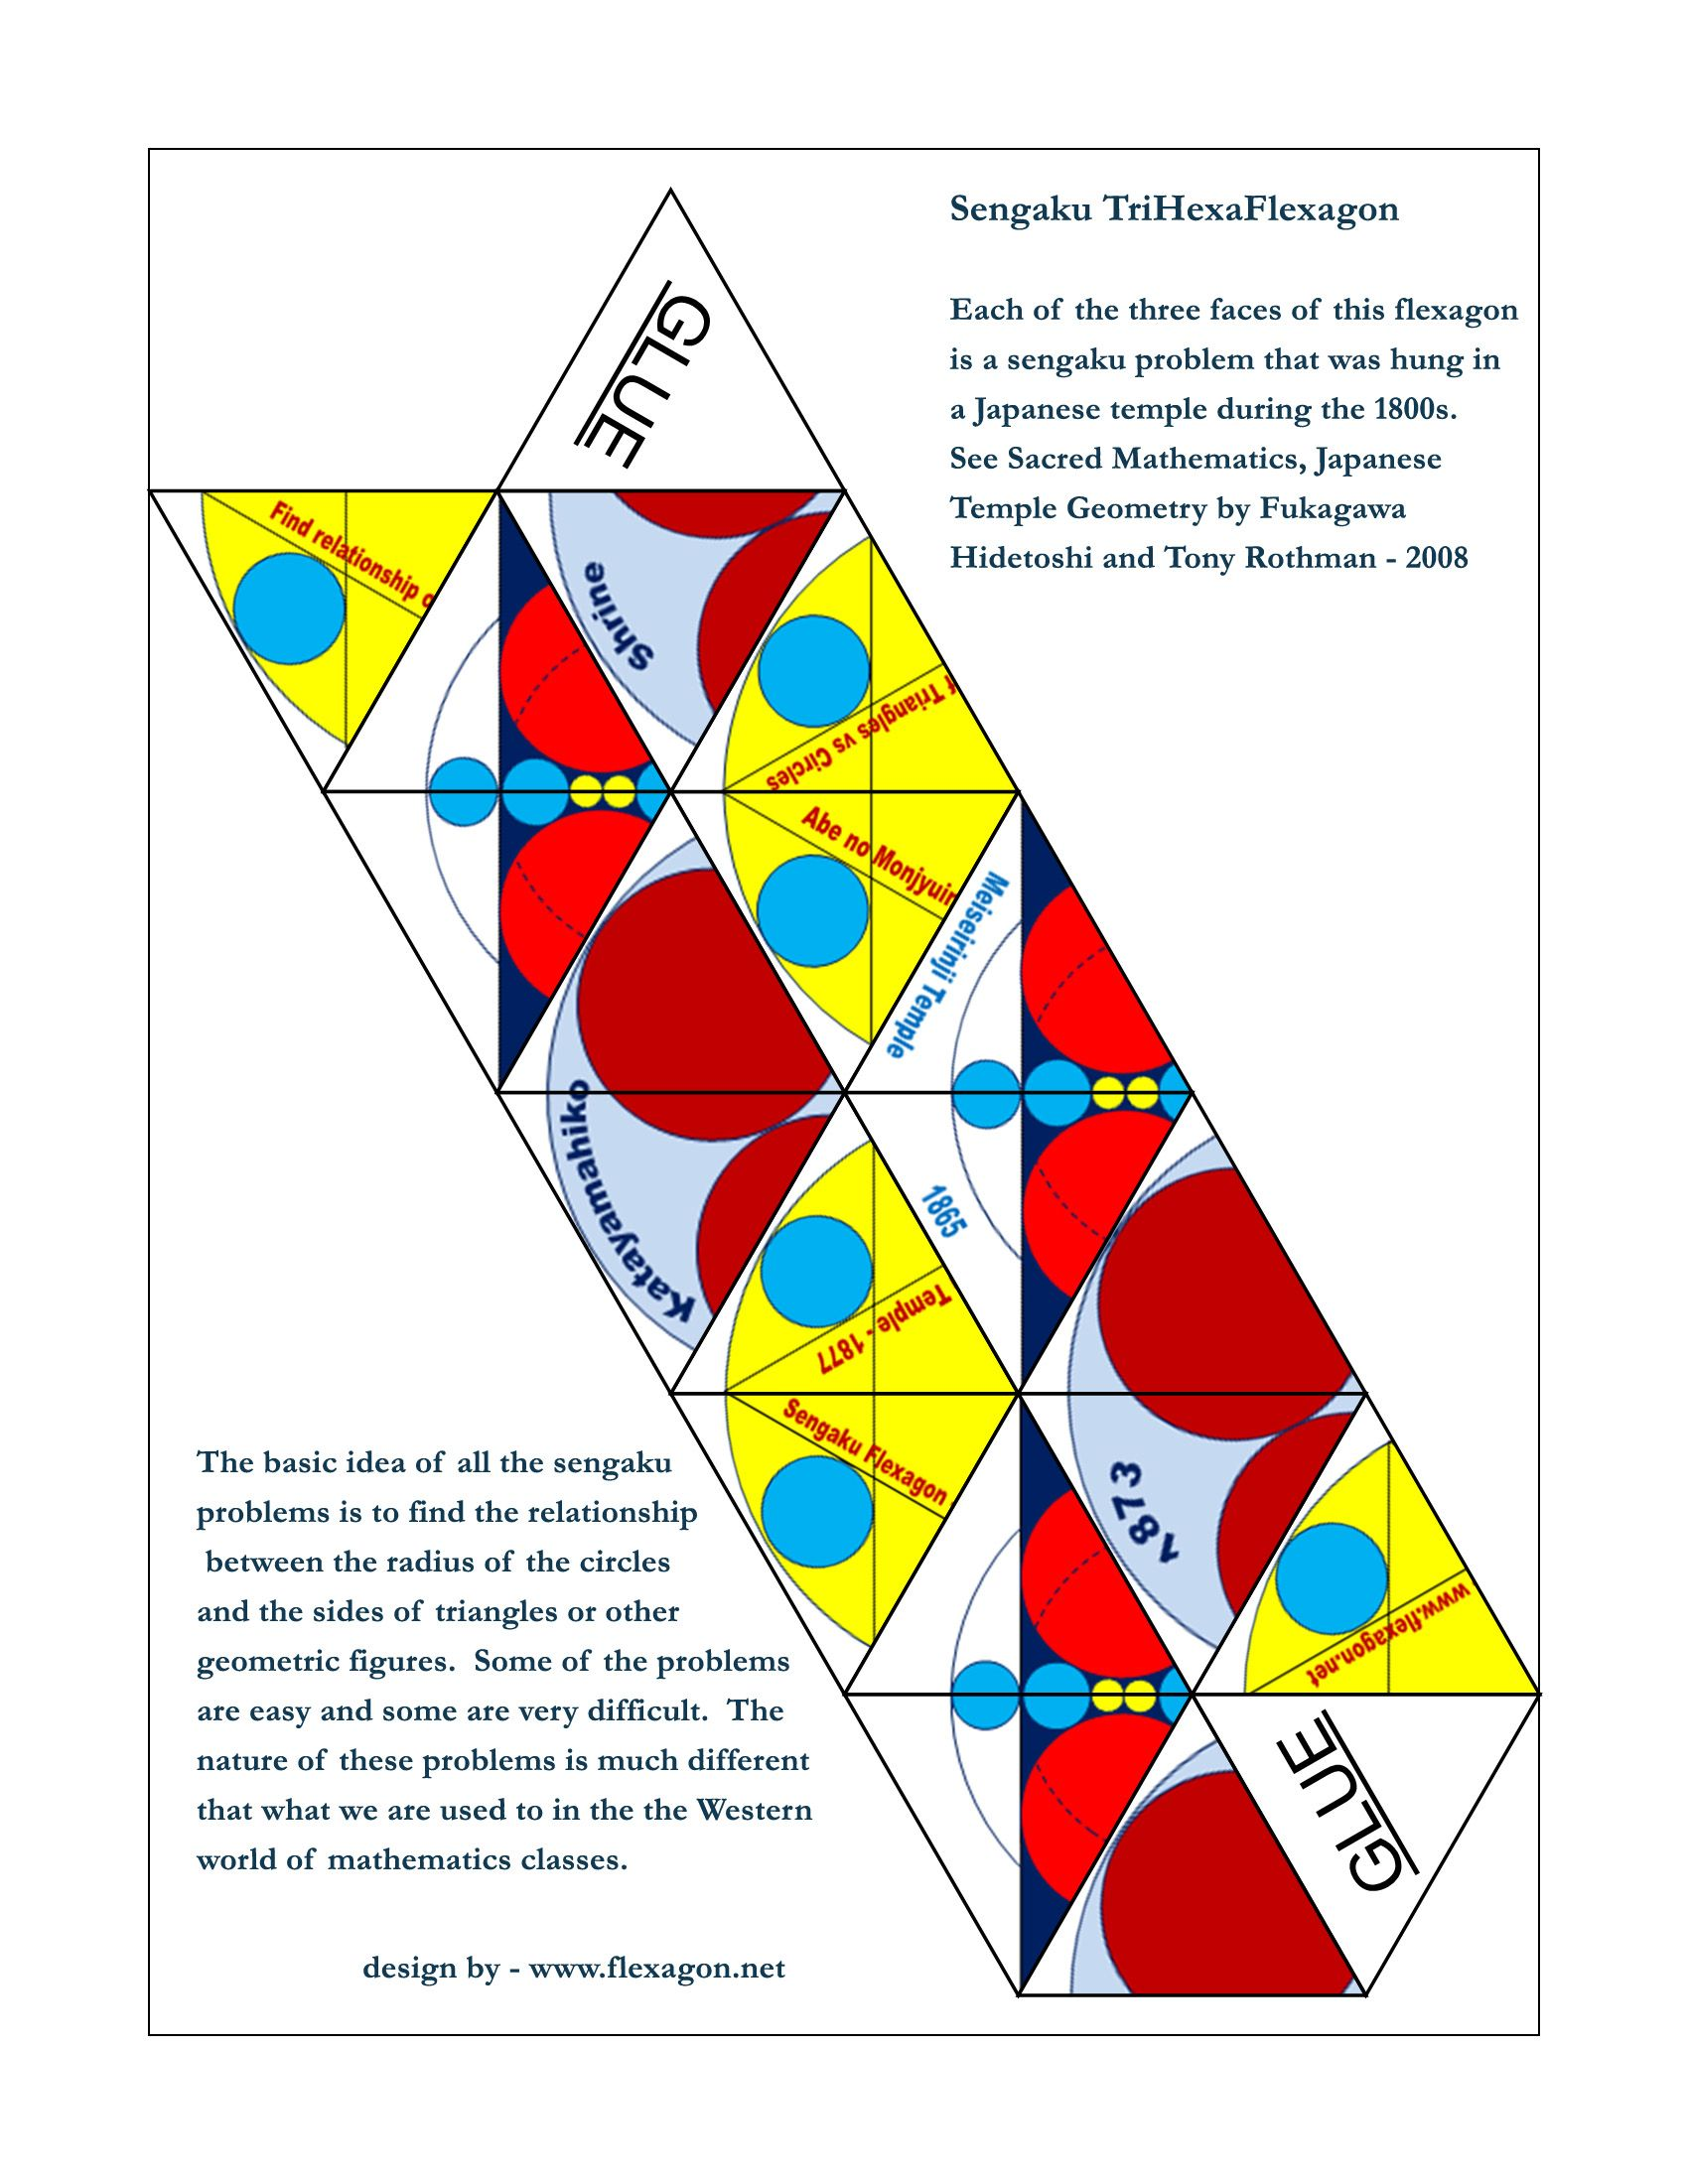 Httpflexagonflexagonstrihexsangakutemplateg httpflexagonflexagonstrihexsangakutemplateg flexagons pinterest math origami and template pronofoot35fo Gallery